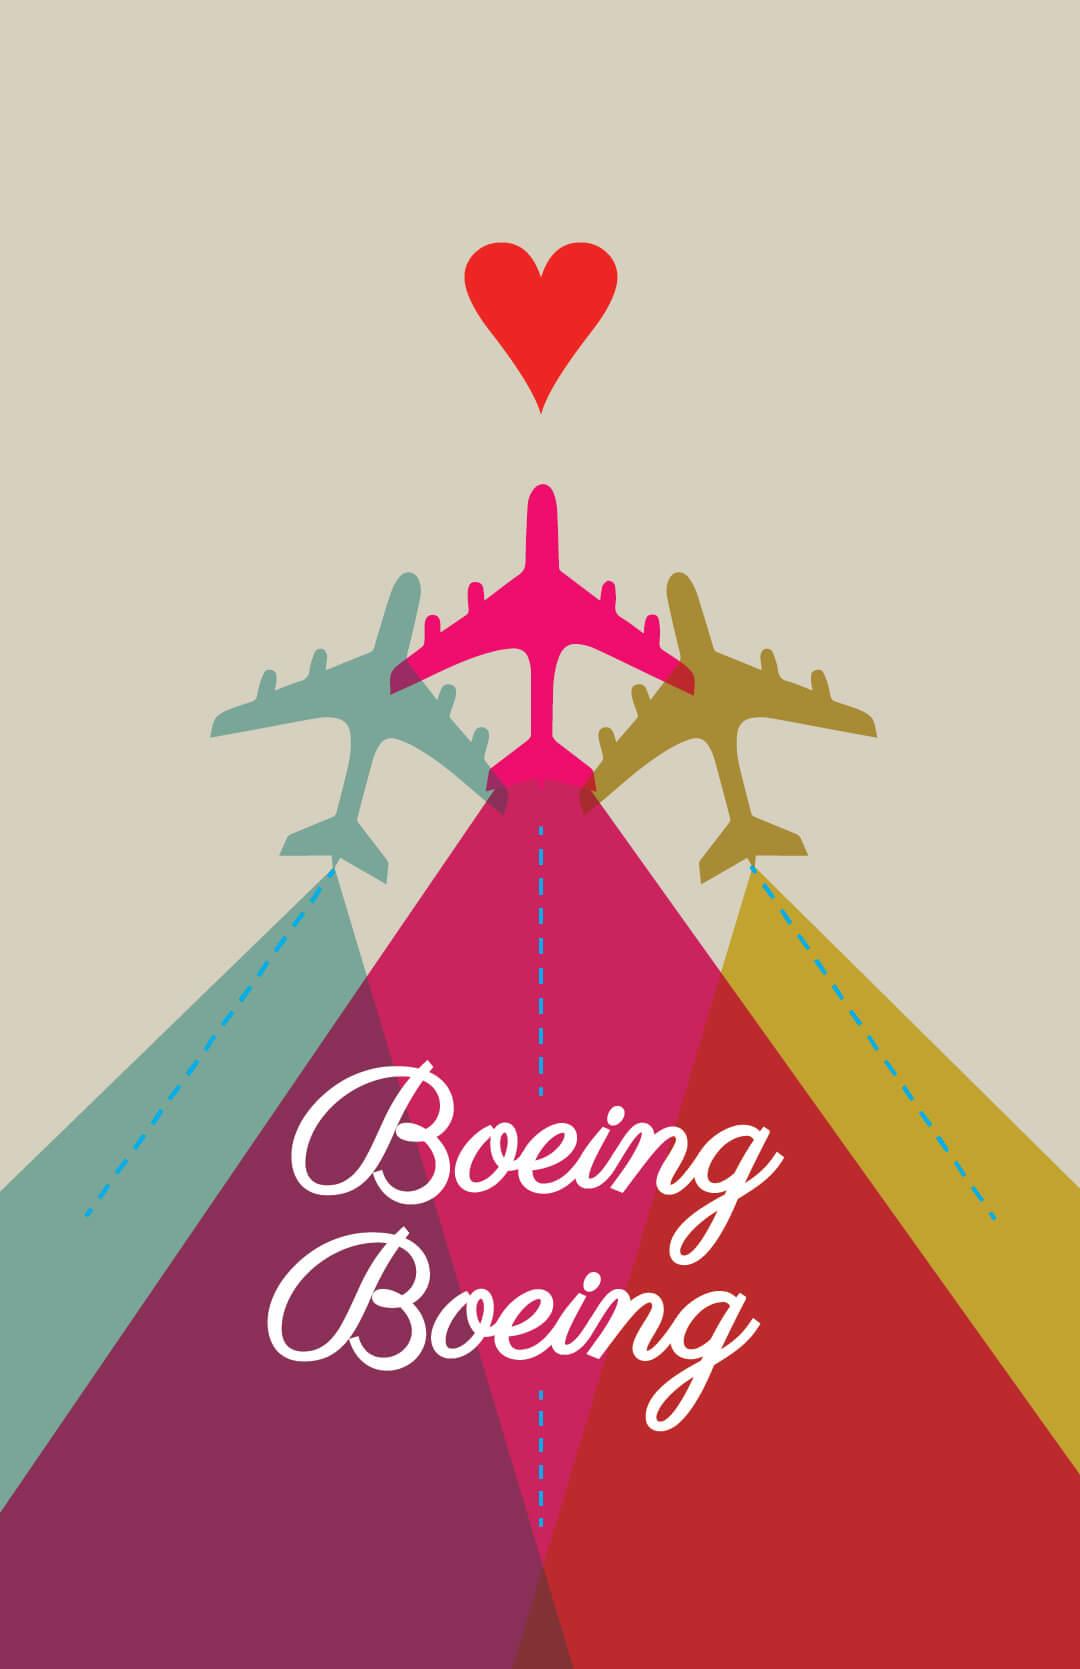 Virginia Tech School of Performing Arts show poster - Boeing Boeing